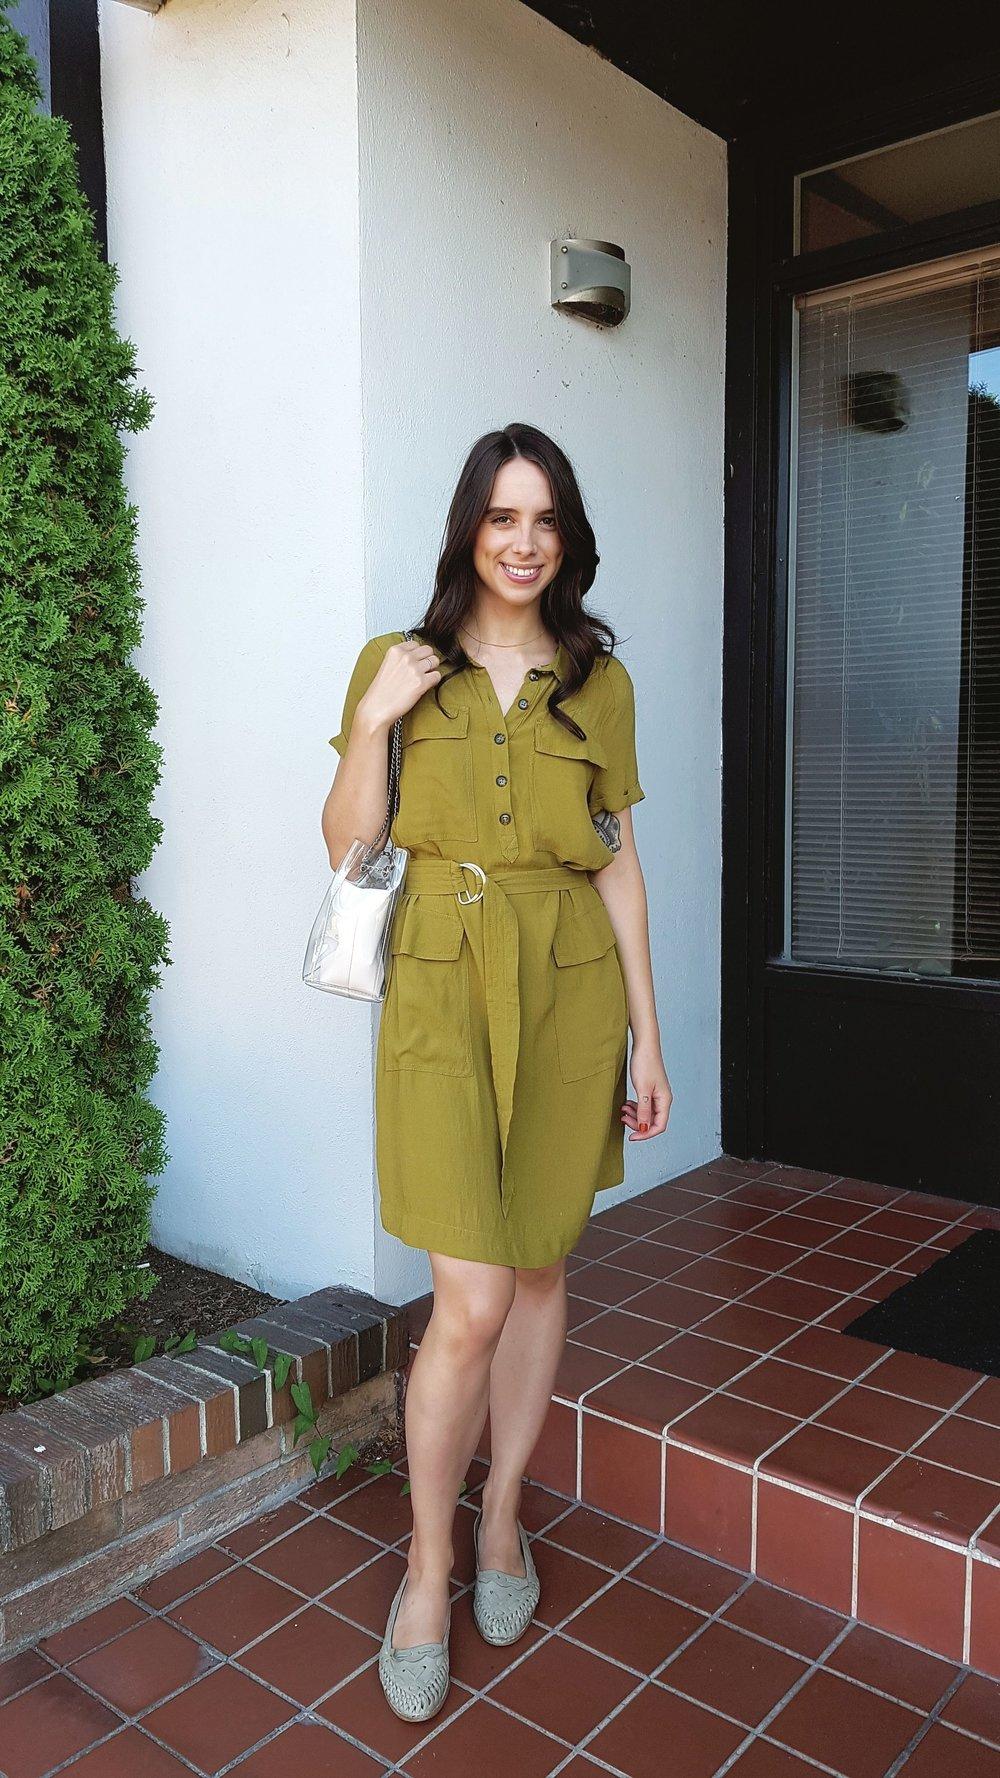 TUESDAY - Zara dress, vintage shoes